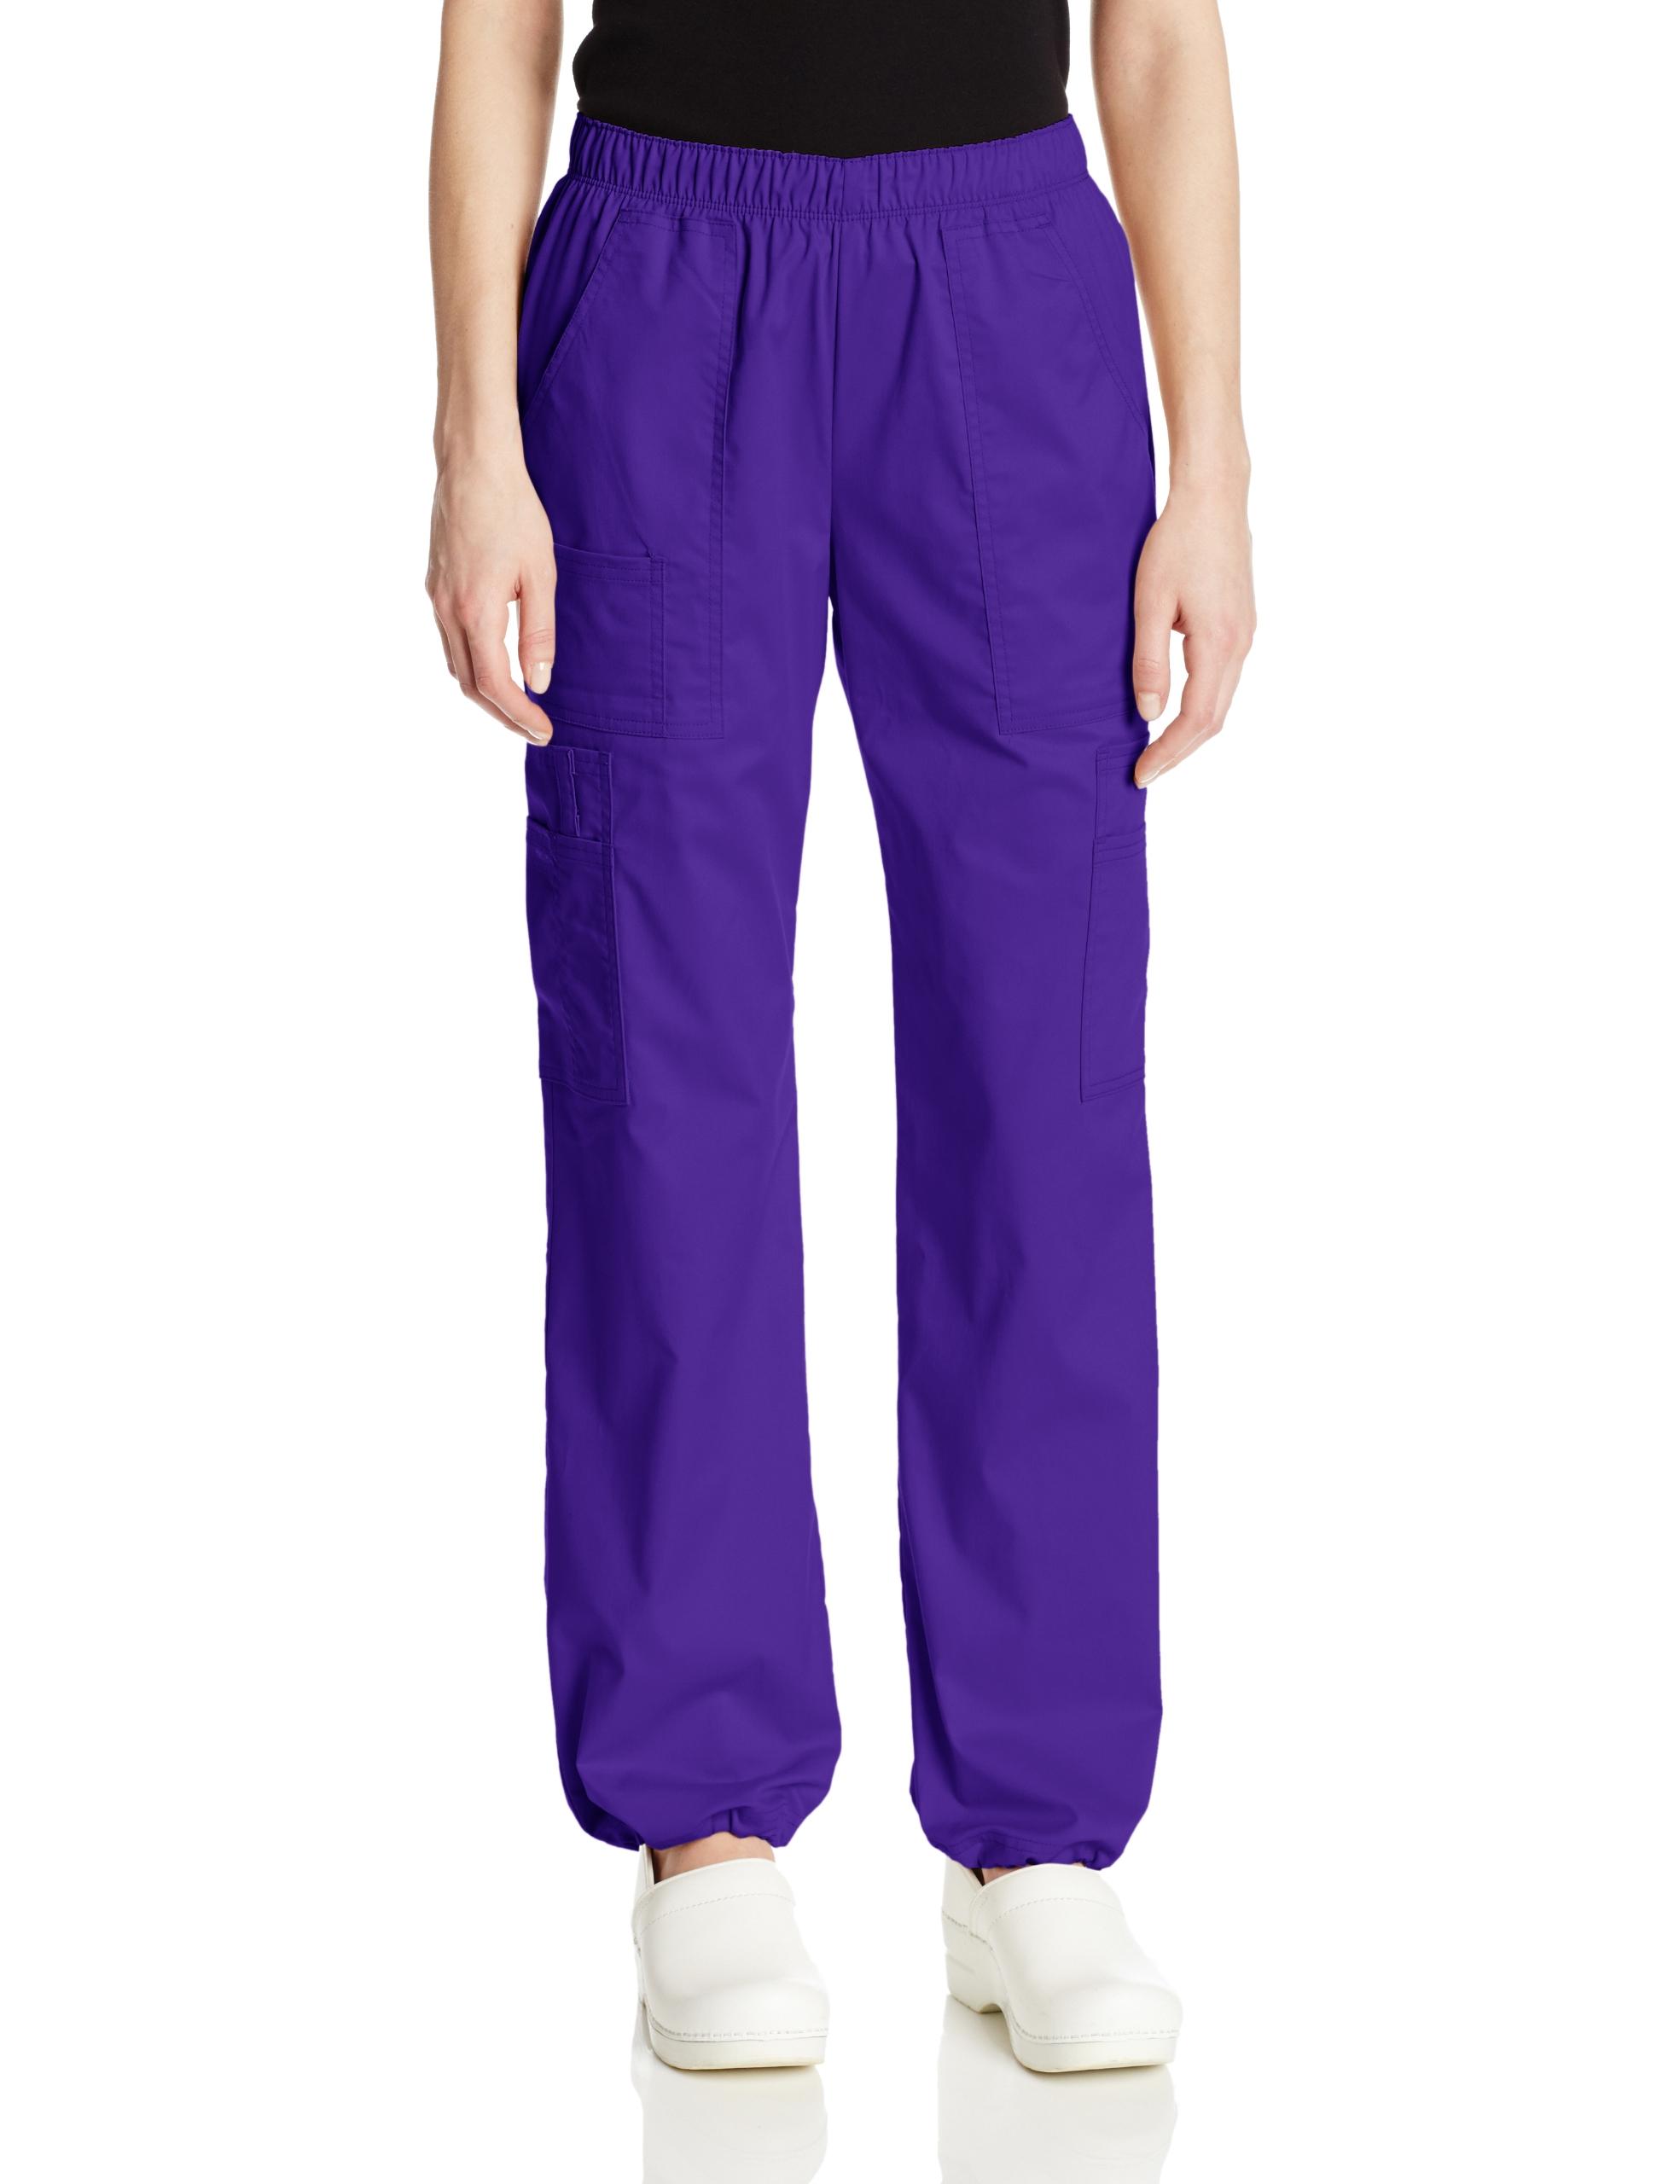 Cherokee Women's Petite Workwear Scrubs Core Stretch Pull-On Cargo Pant, Grape, X-Large-Petite